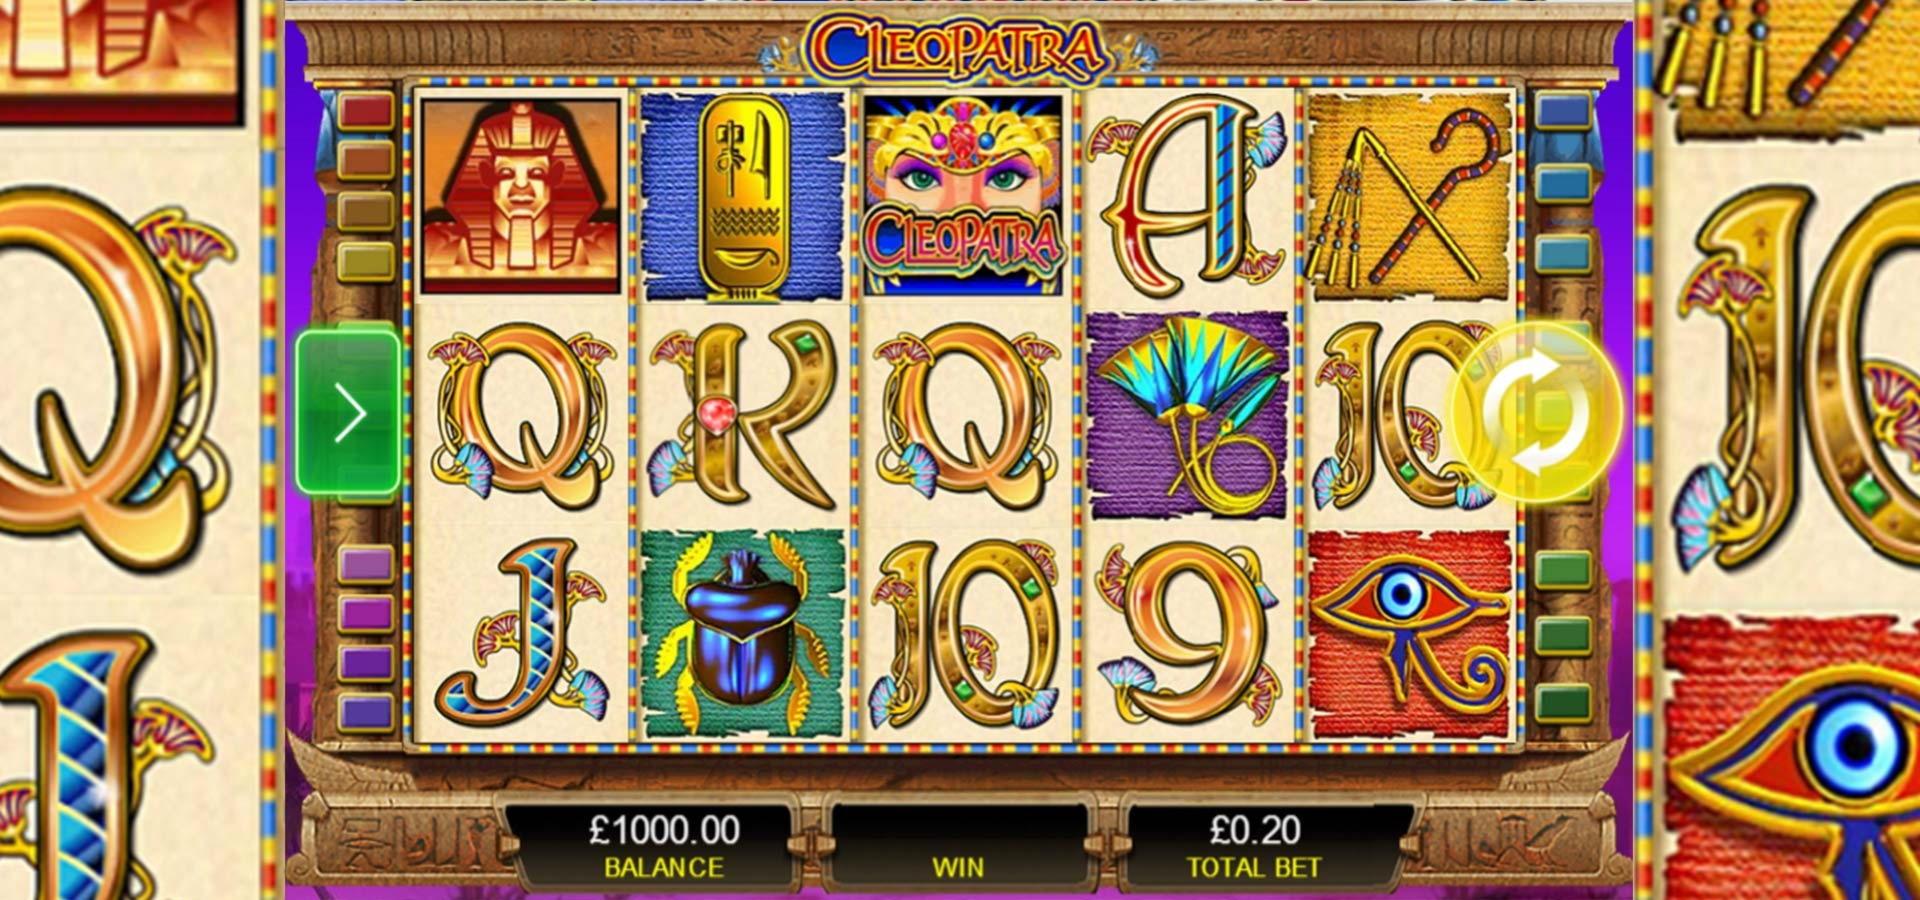 55 Free Spins no deposit at Genesis Casino